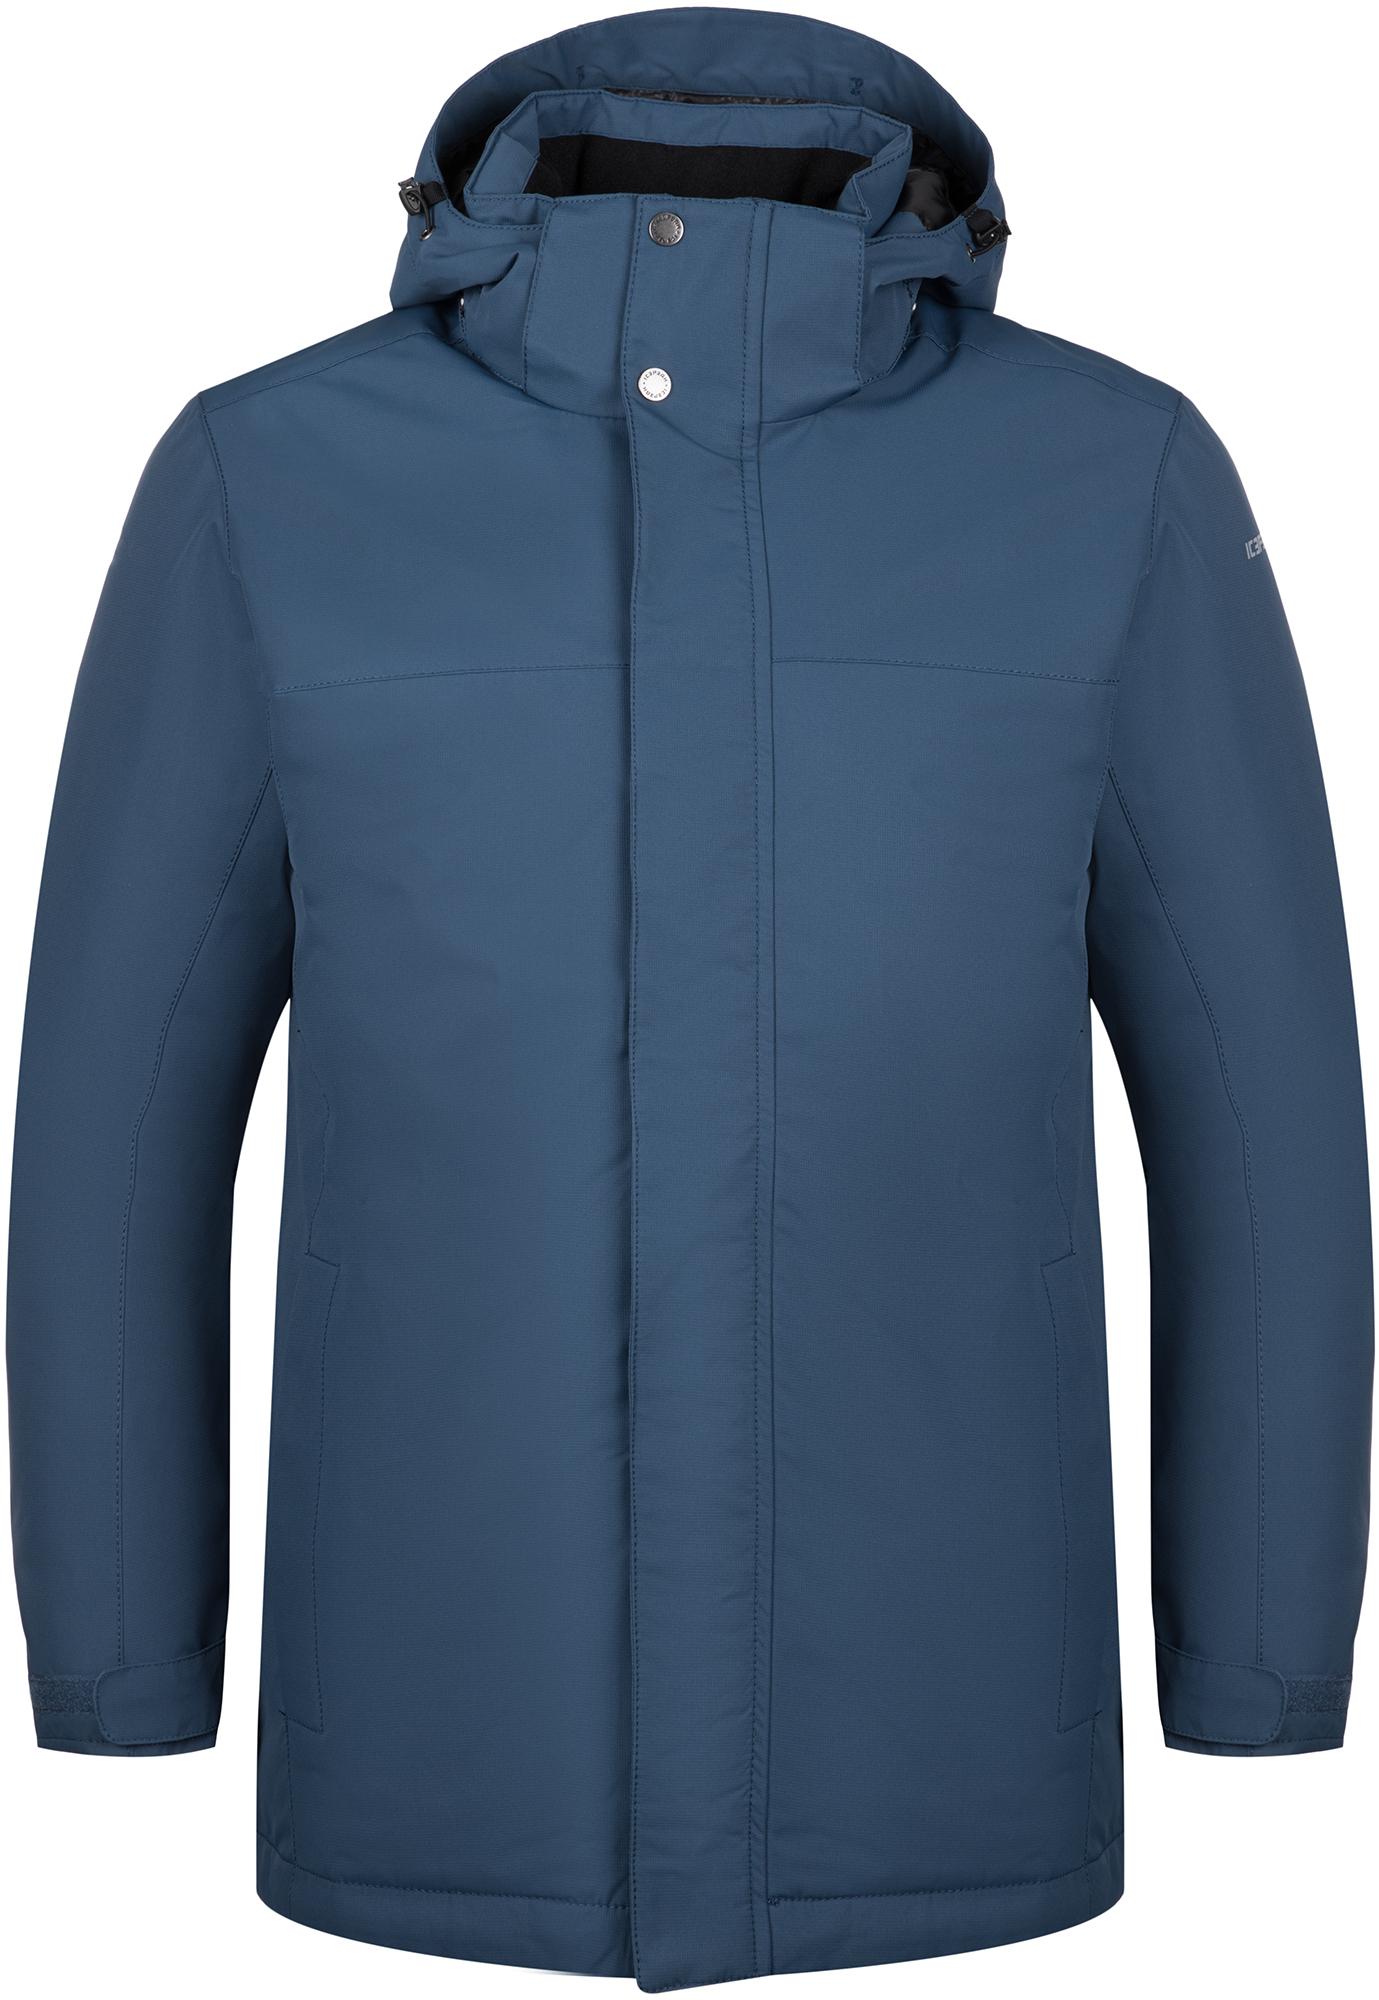 IcePeak Куртка утепленная мужская IcePeak Vanleer, размер 52 цена 2017